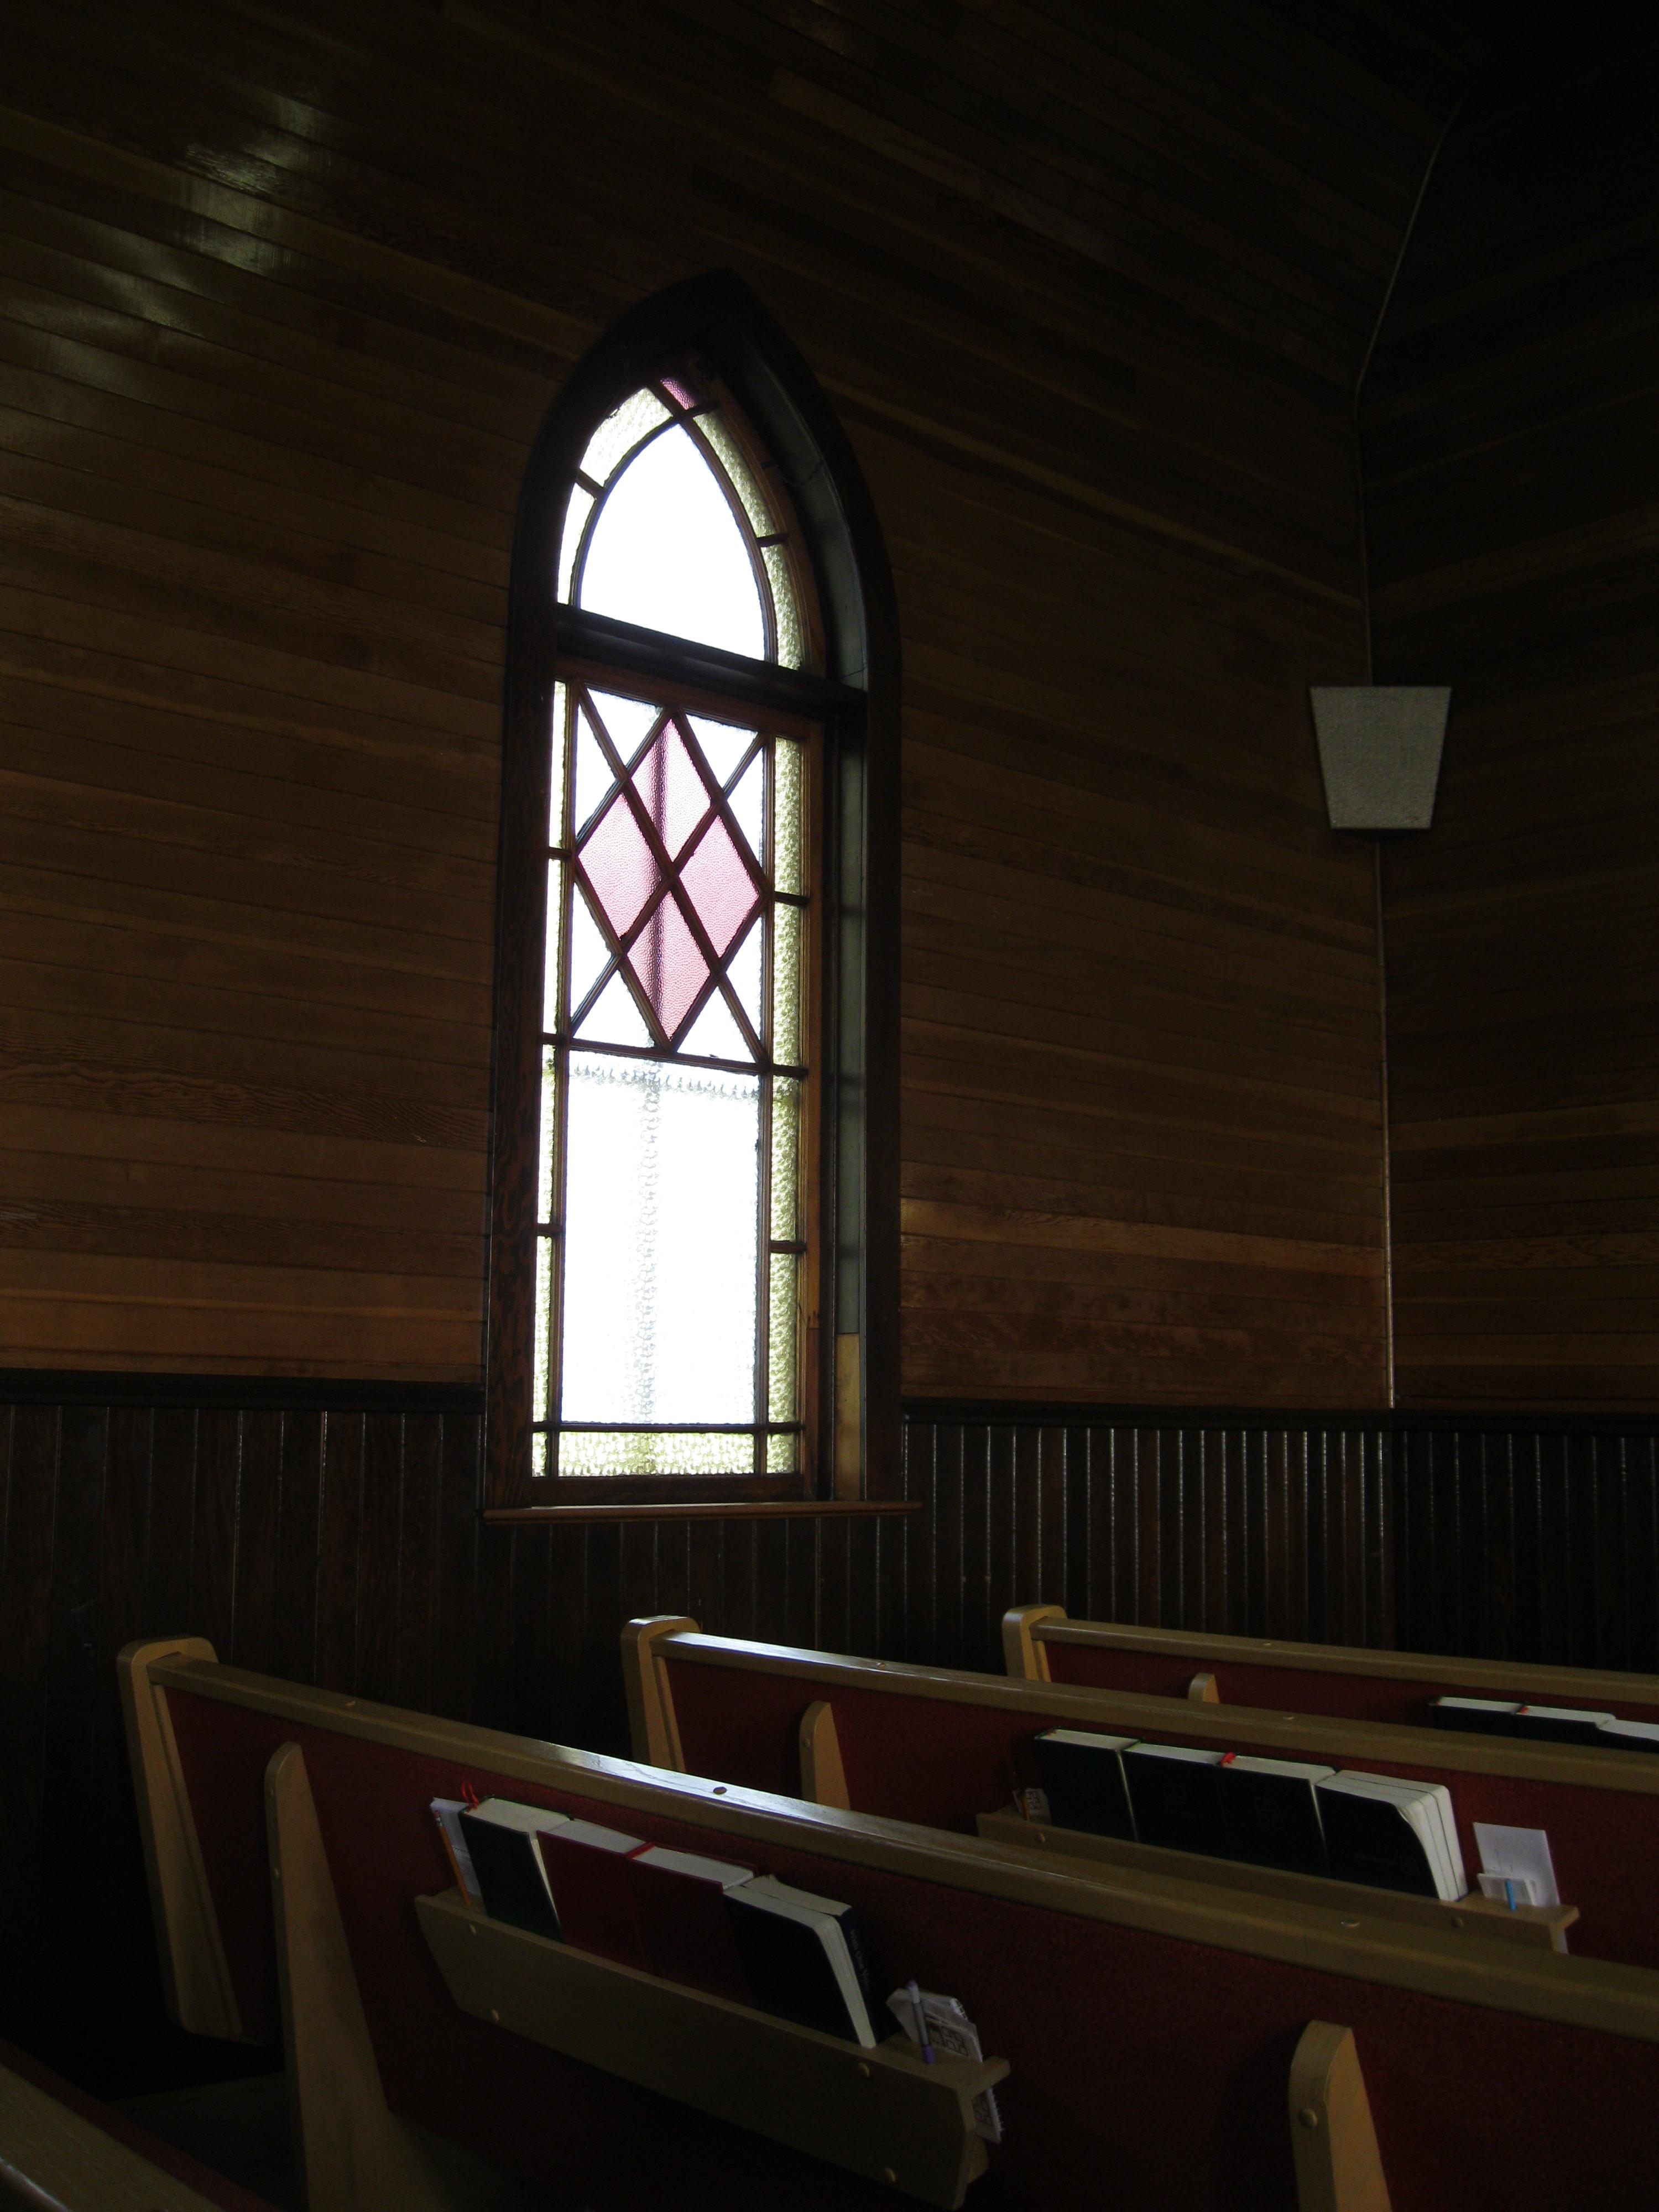 church interior with glass windows